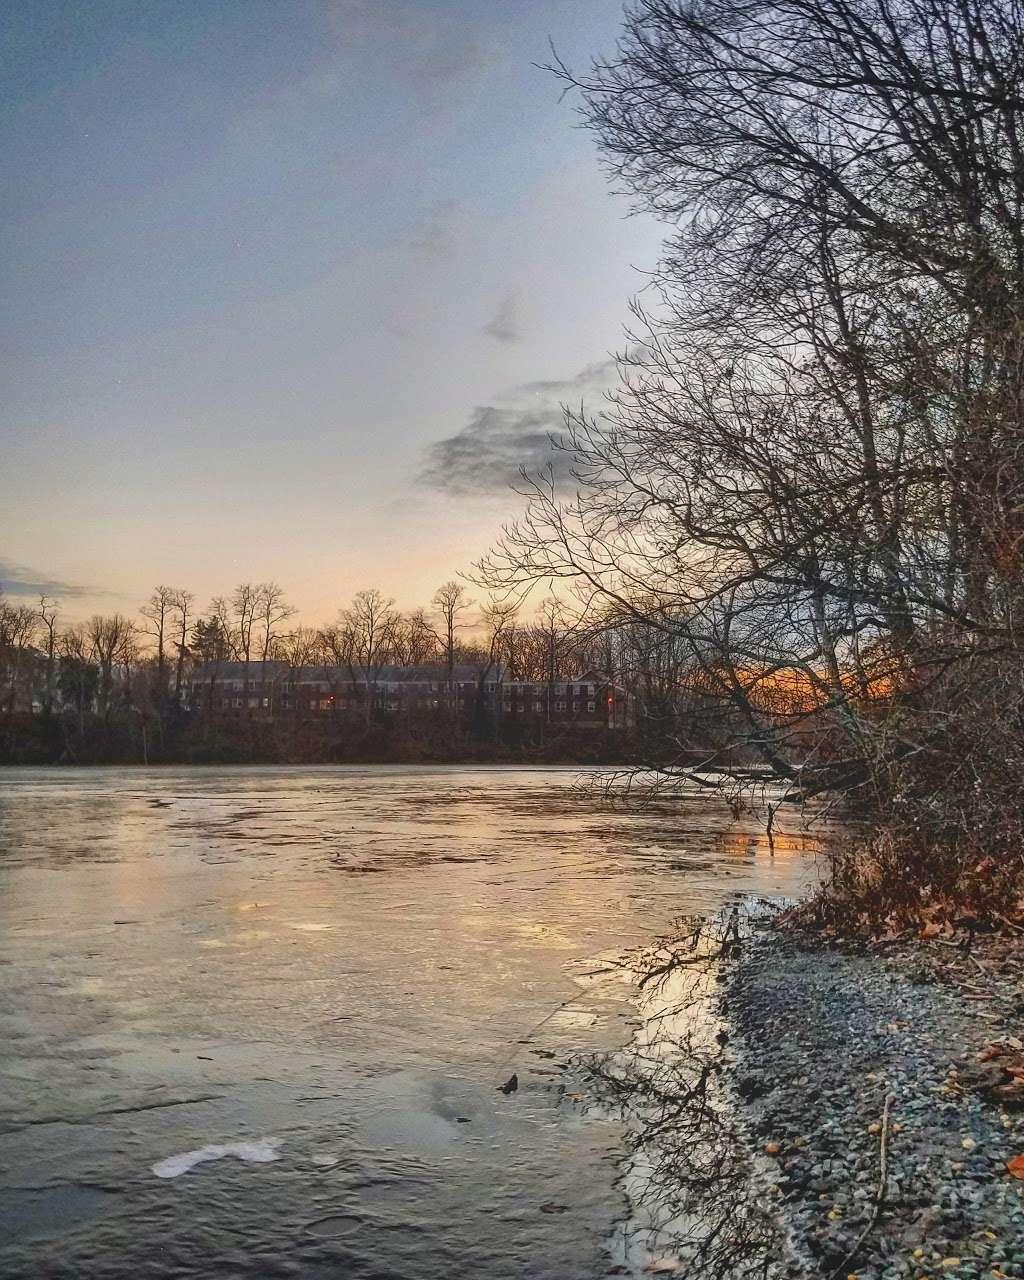 Lake Lefferts Lakefront Park - park  | Photo 2 of 3 | Address: Ravine Dr, Matawan, NJ 07747, USA